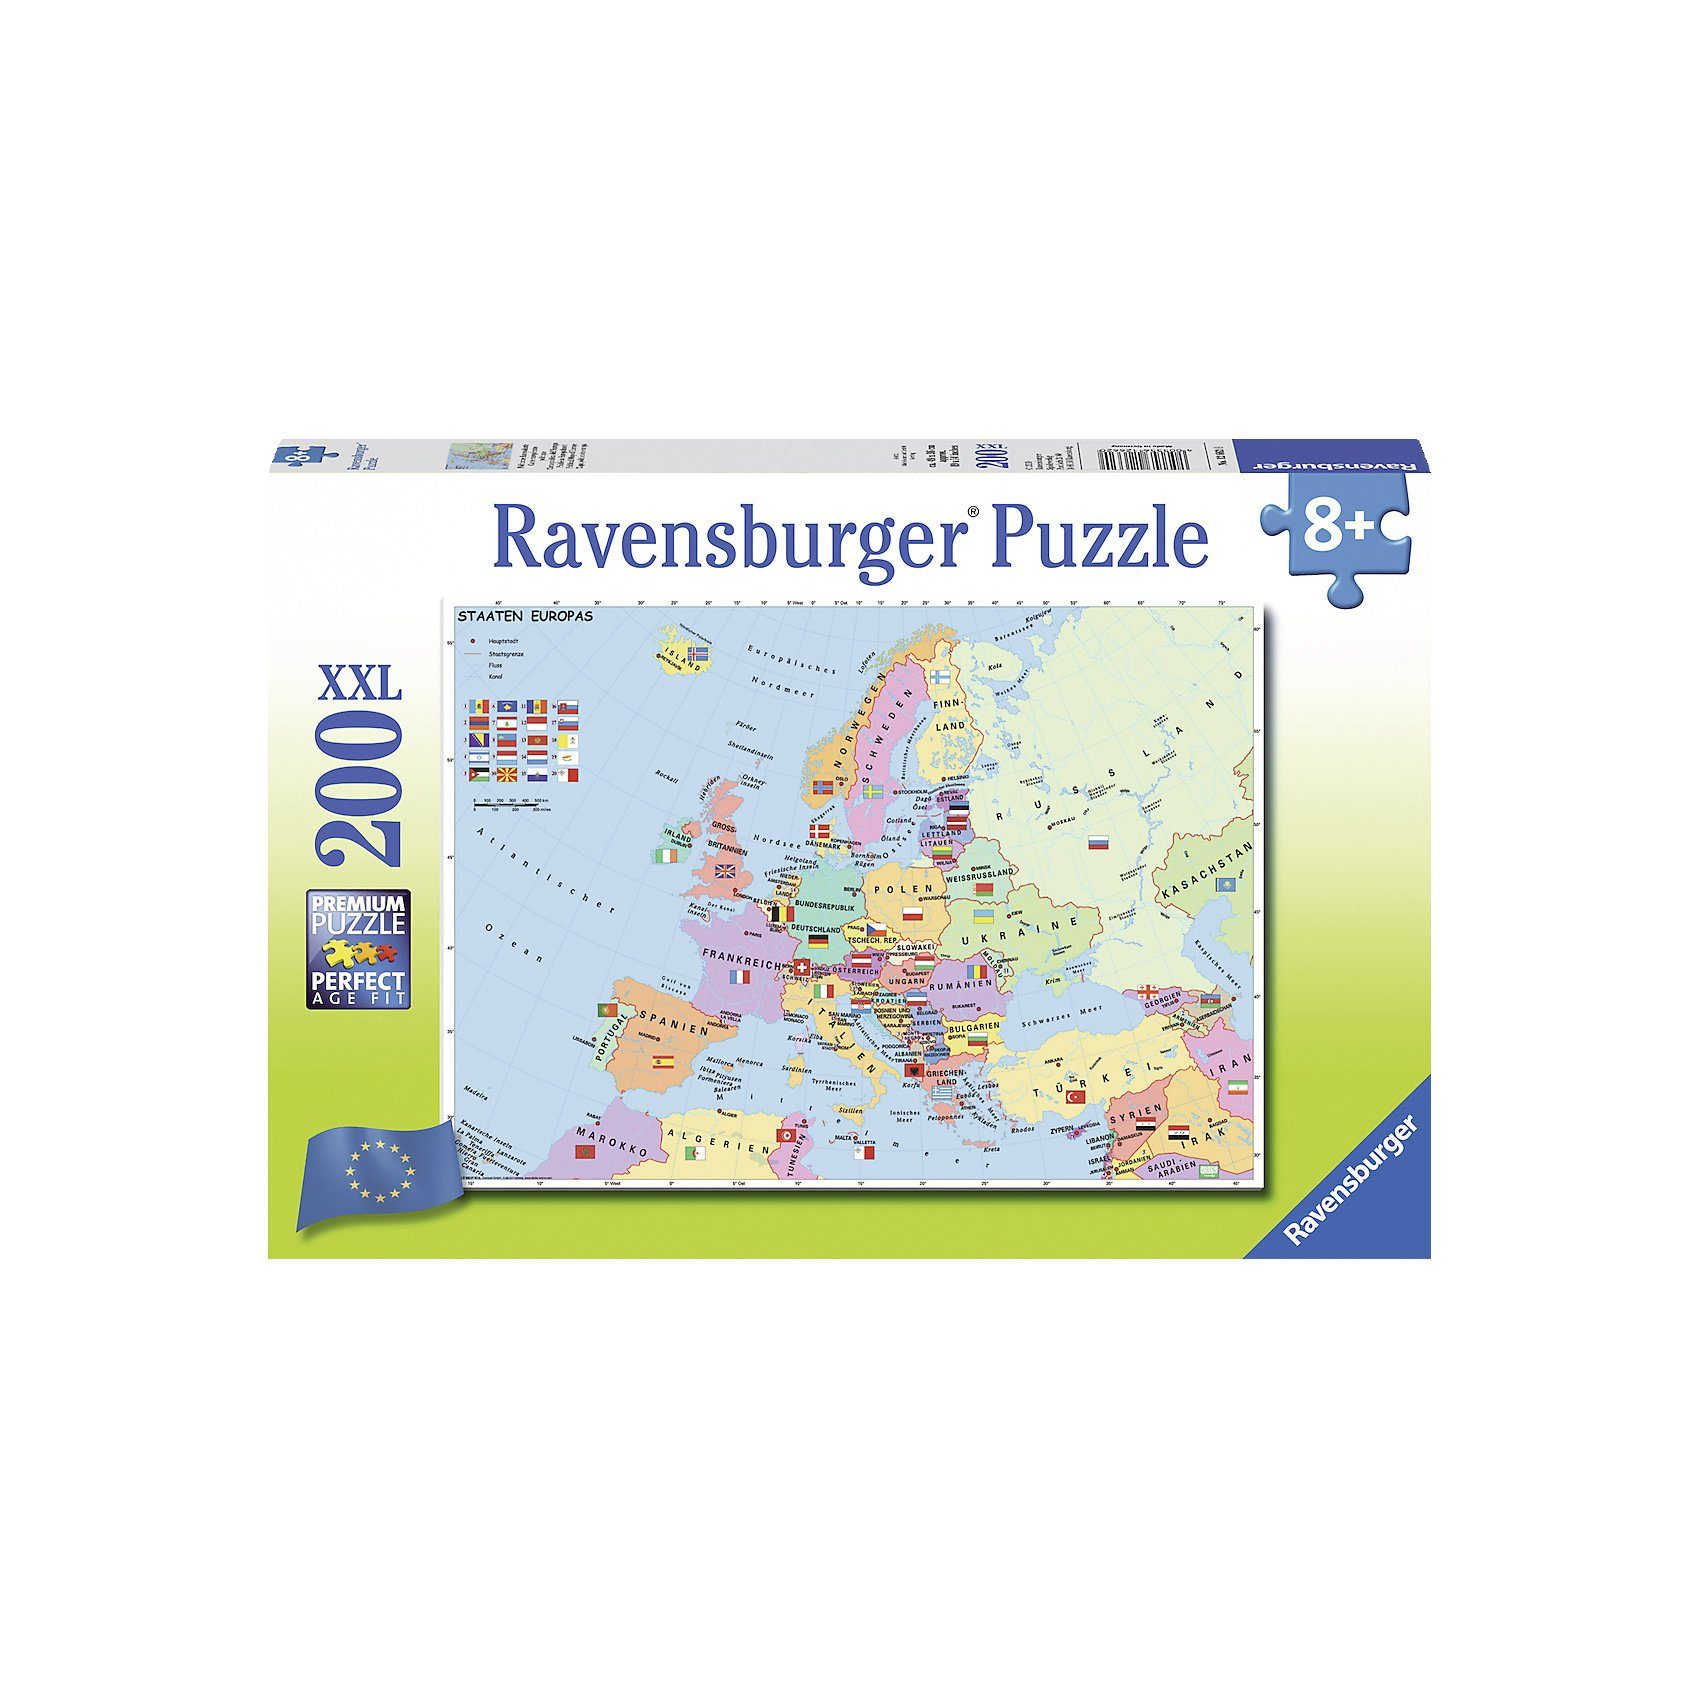 Ravensburger Politsche Europakarte - 200 Teile XXL Puzzle